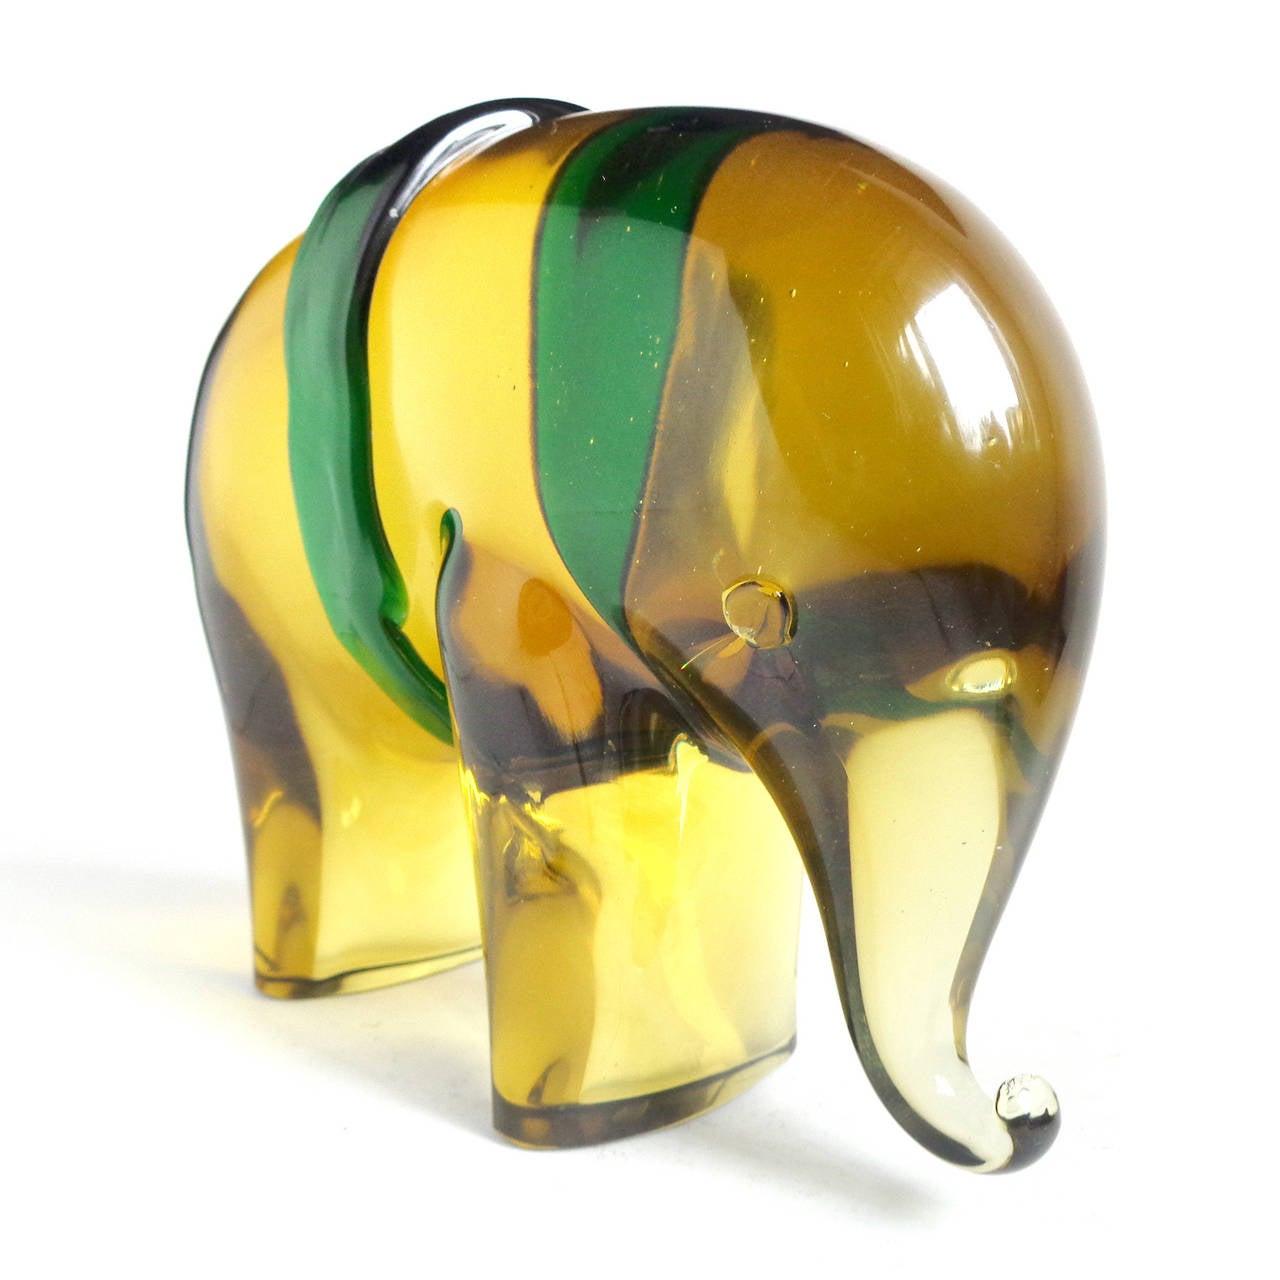 Gaspari Salviati Murano Sommerso Italian Art Glass